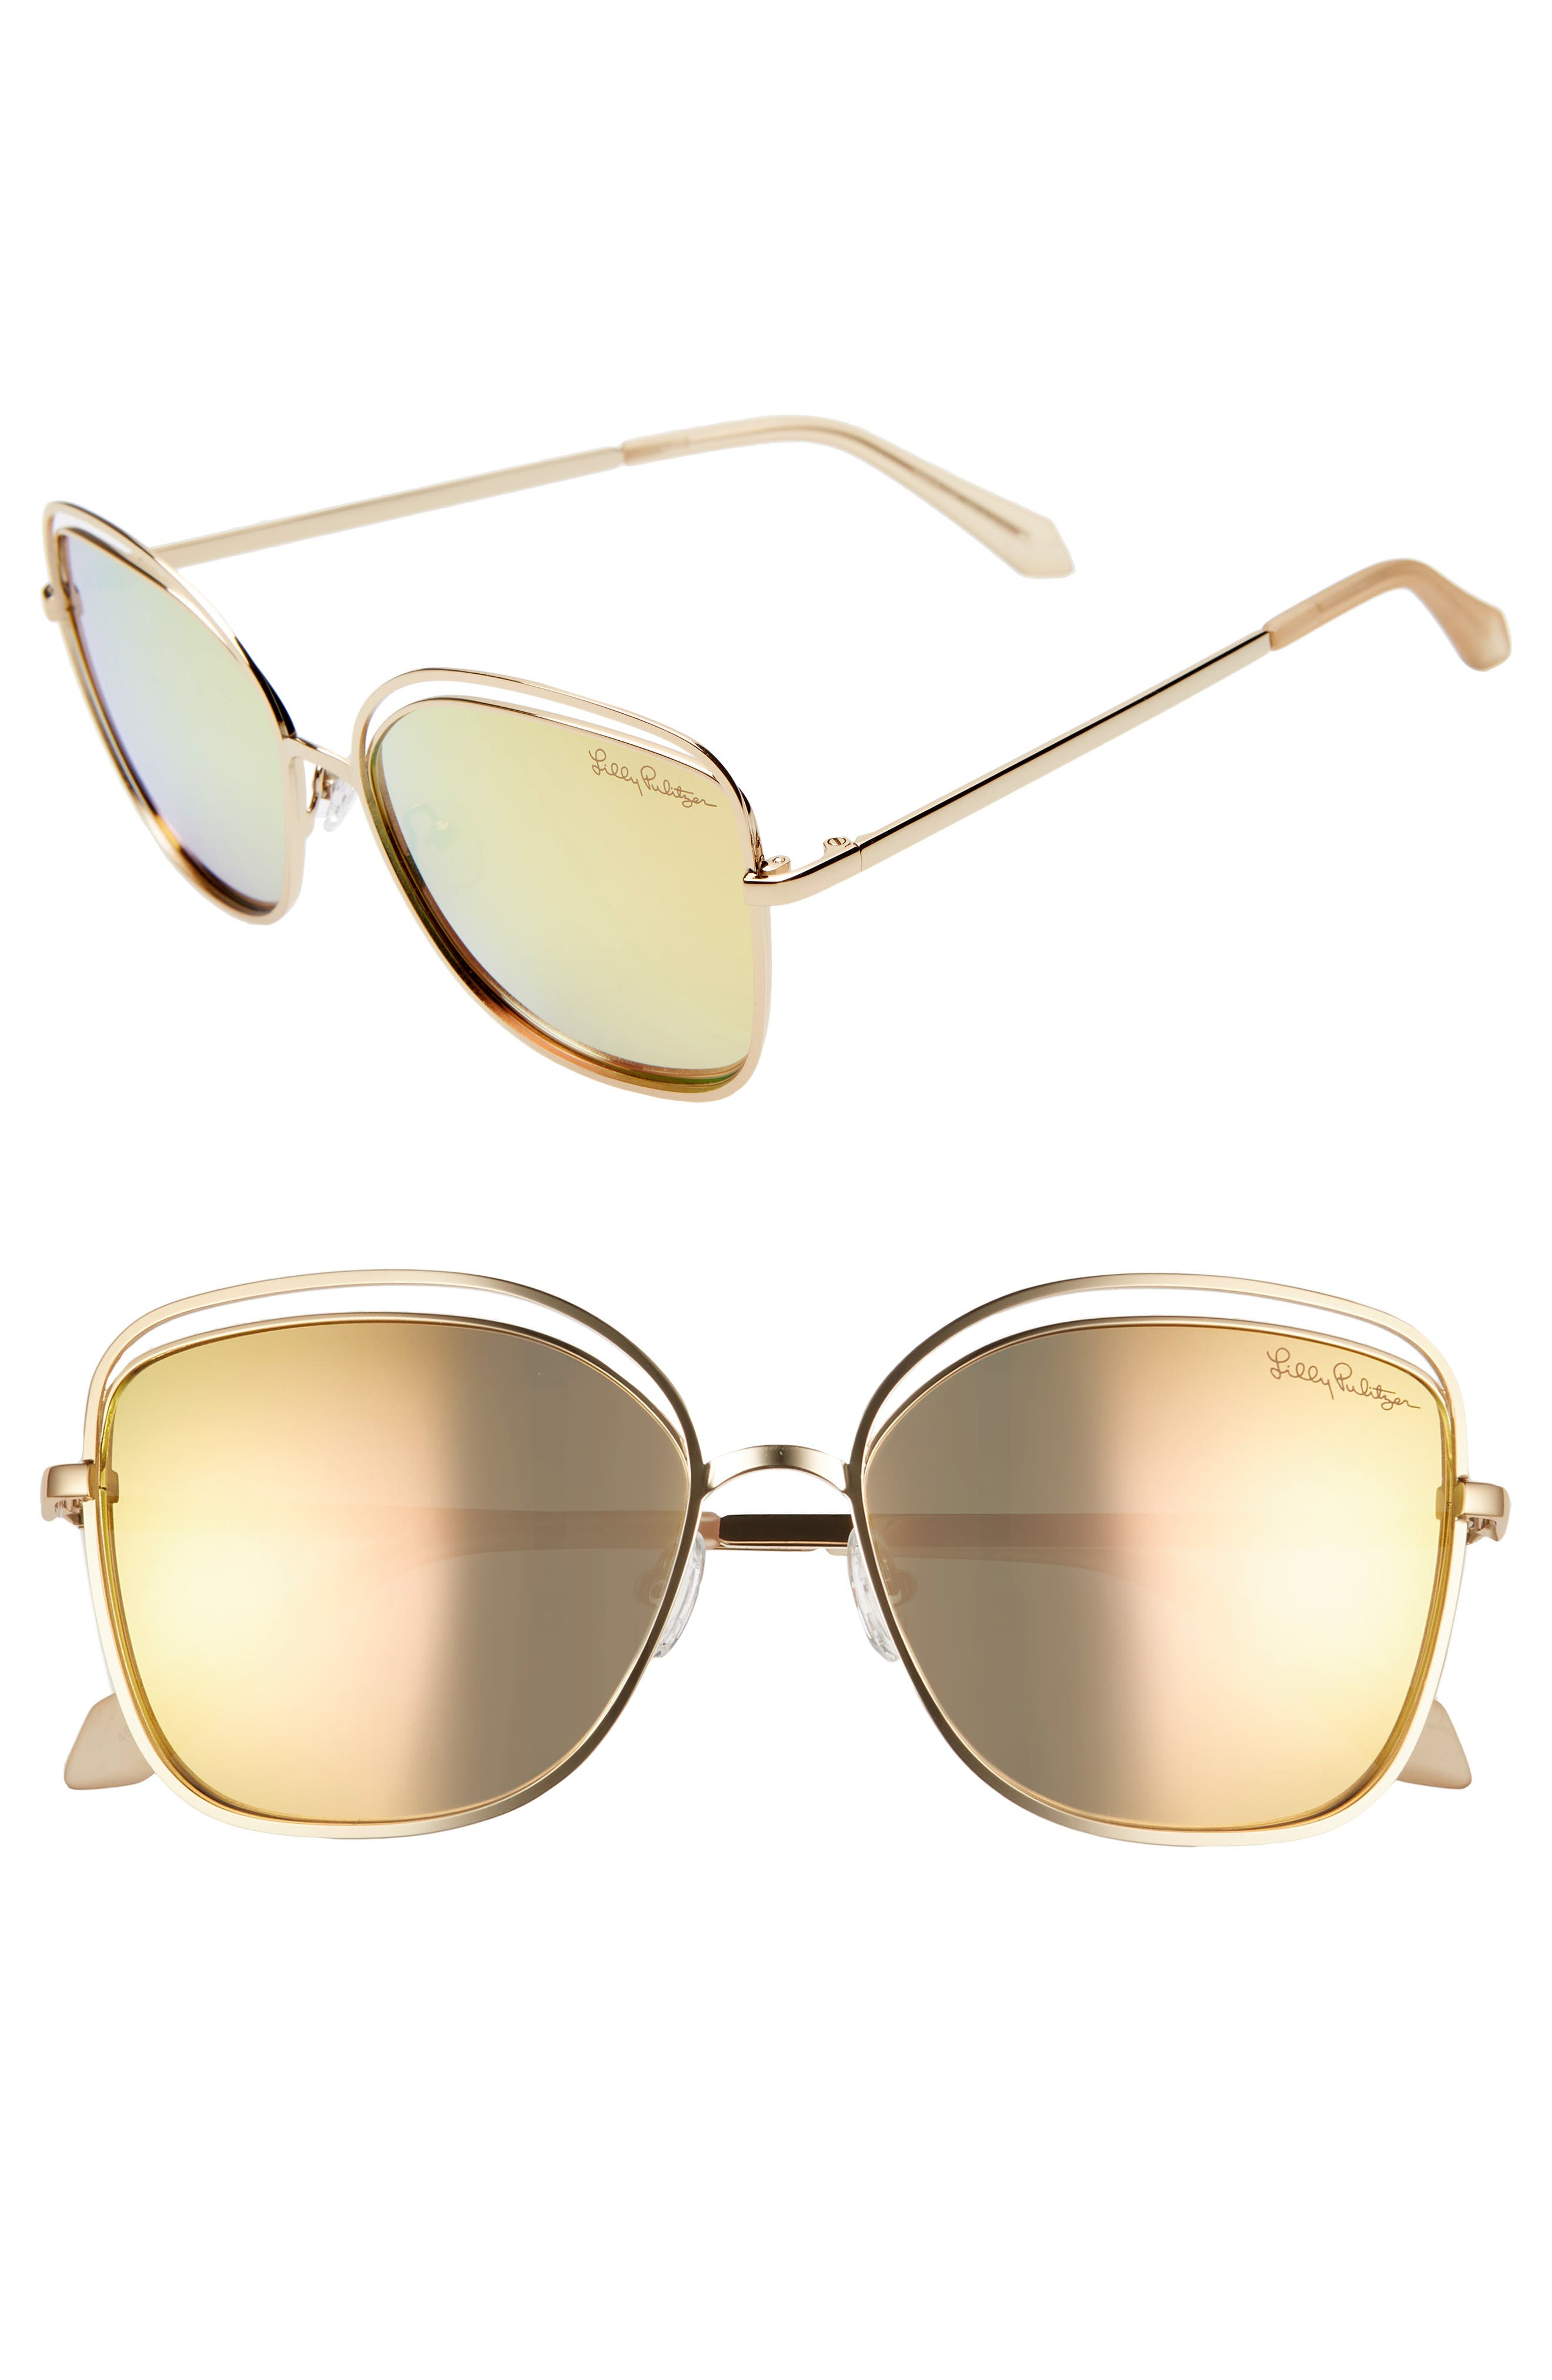 Lilly Pulitzer Nina 5m Cat Eye Sunglasses - Shiny Gold/ Gold Mirror